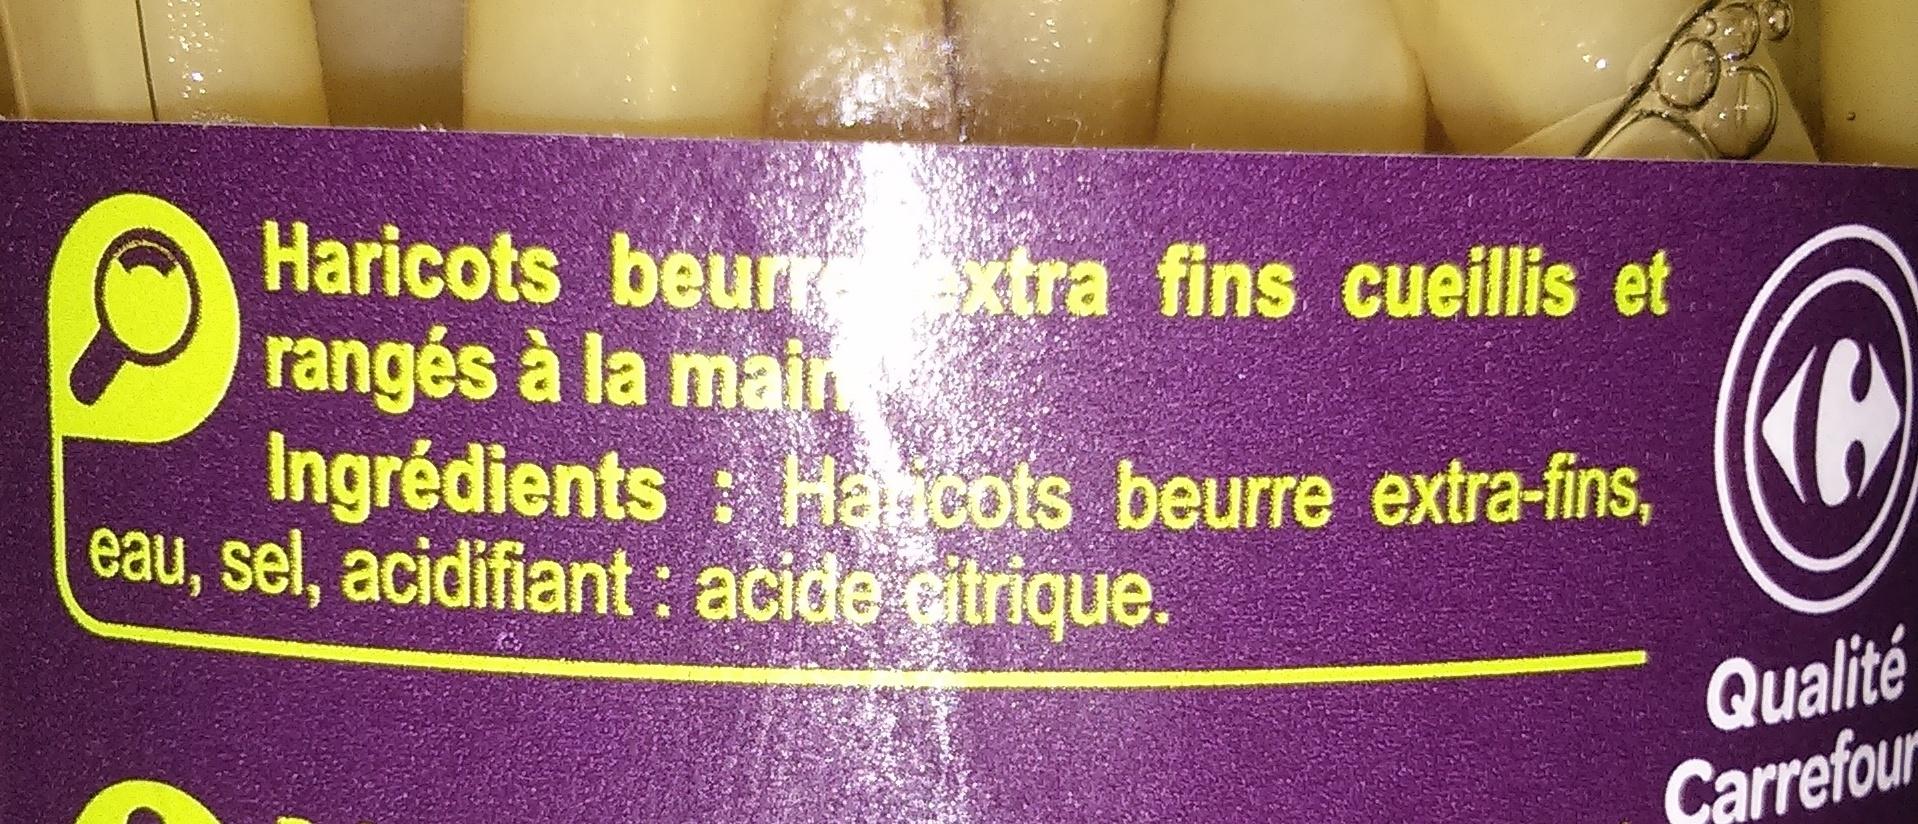 Haricots beurre extra- fins - Ingrédients - fr